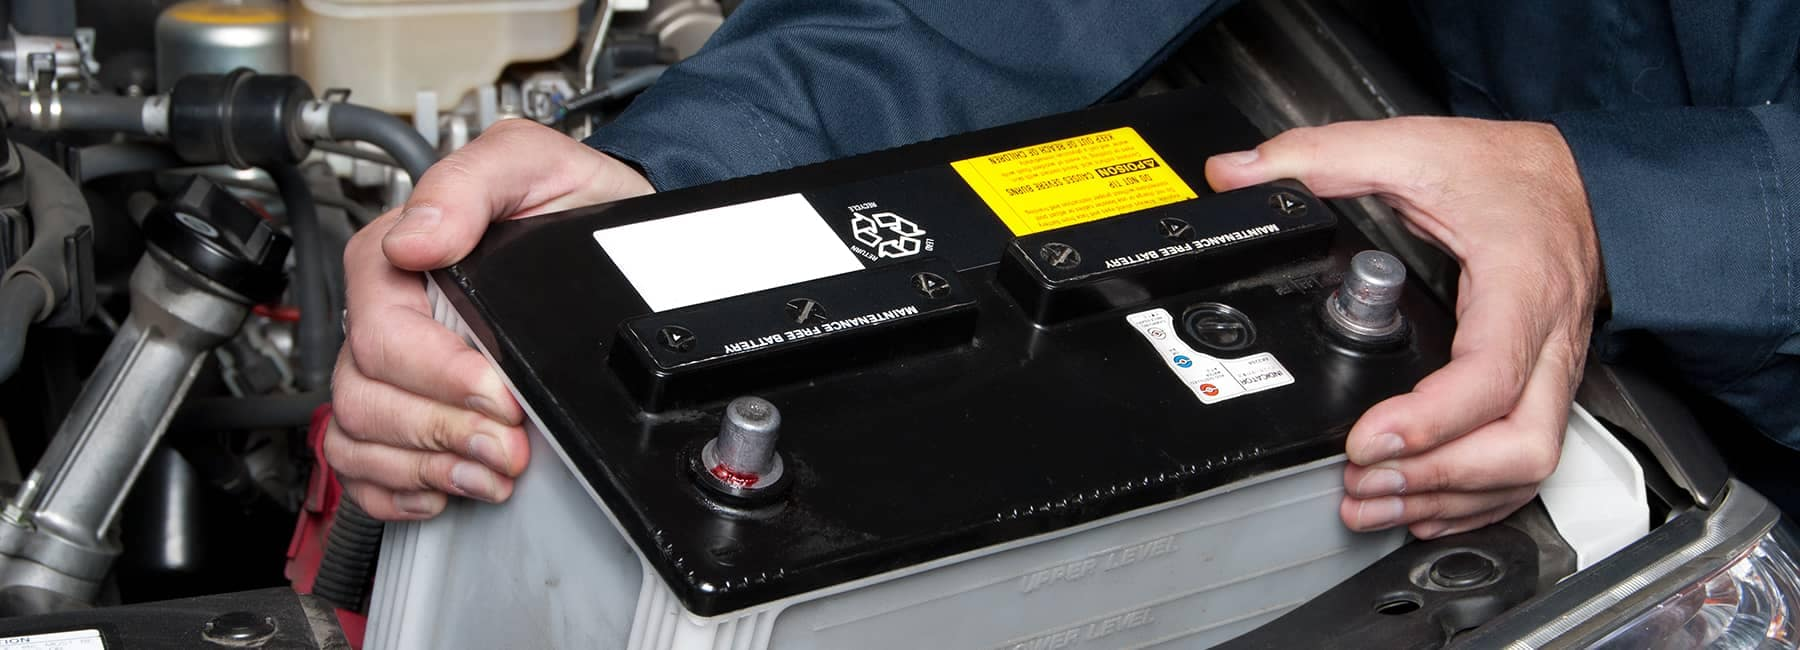 technician installing car battery